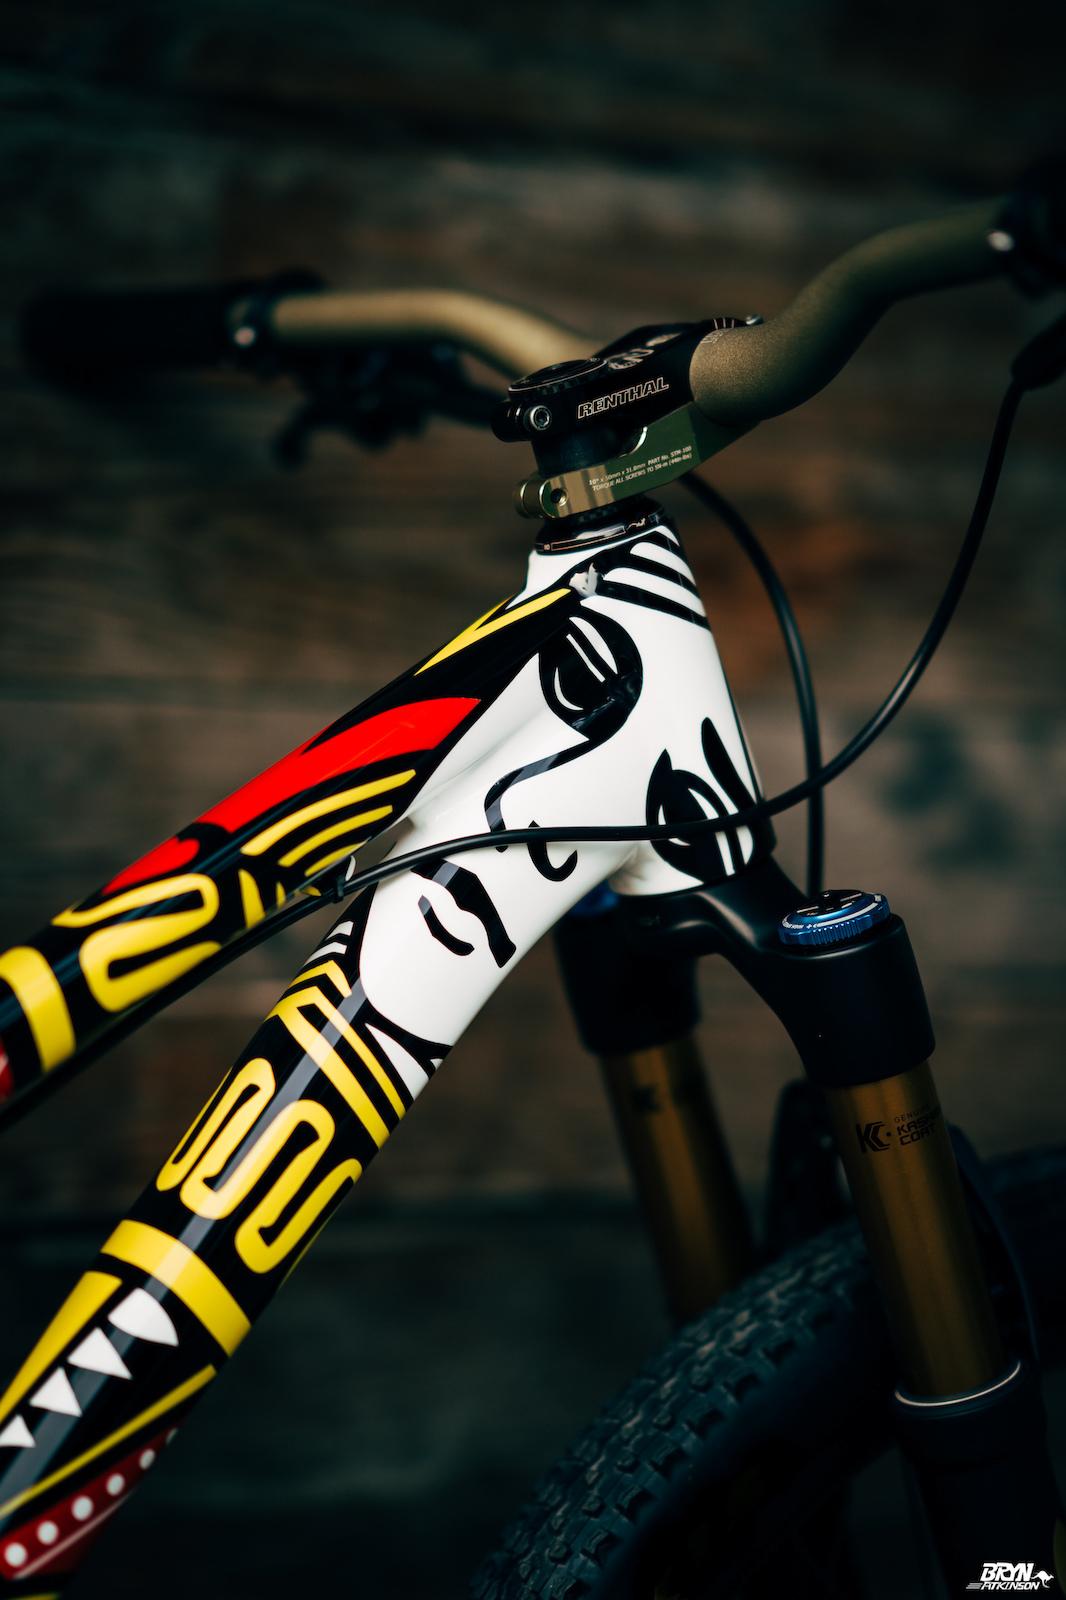 Adesivo para bike: deixe a bicicleta a sua cara